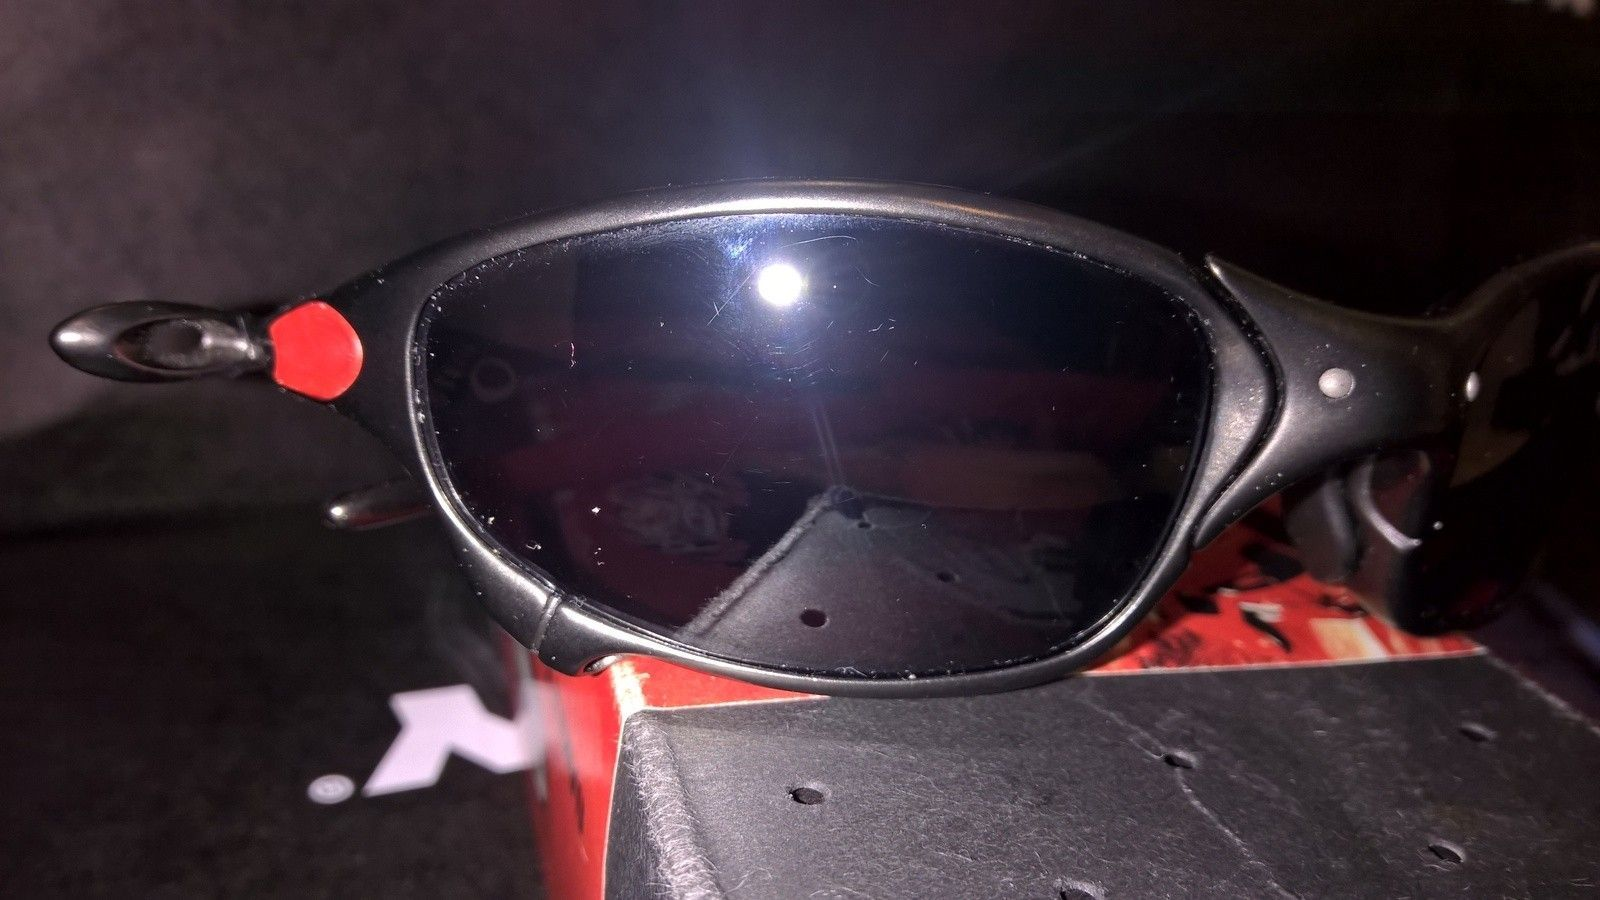 Ti Gold Romeo 1 / Ducati Juliet / Ti Ice Penny / X Metal XX / Ti VR28 Penny - WP_20150323_19_34_51_Pro.jpg